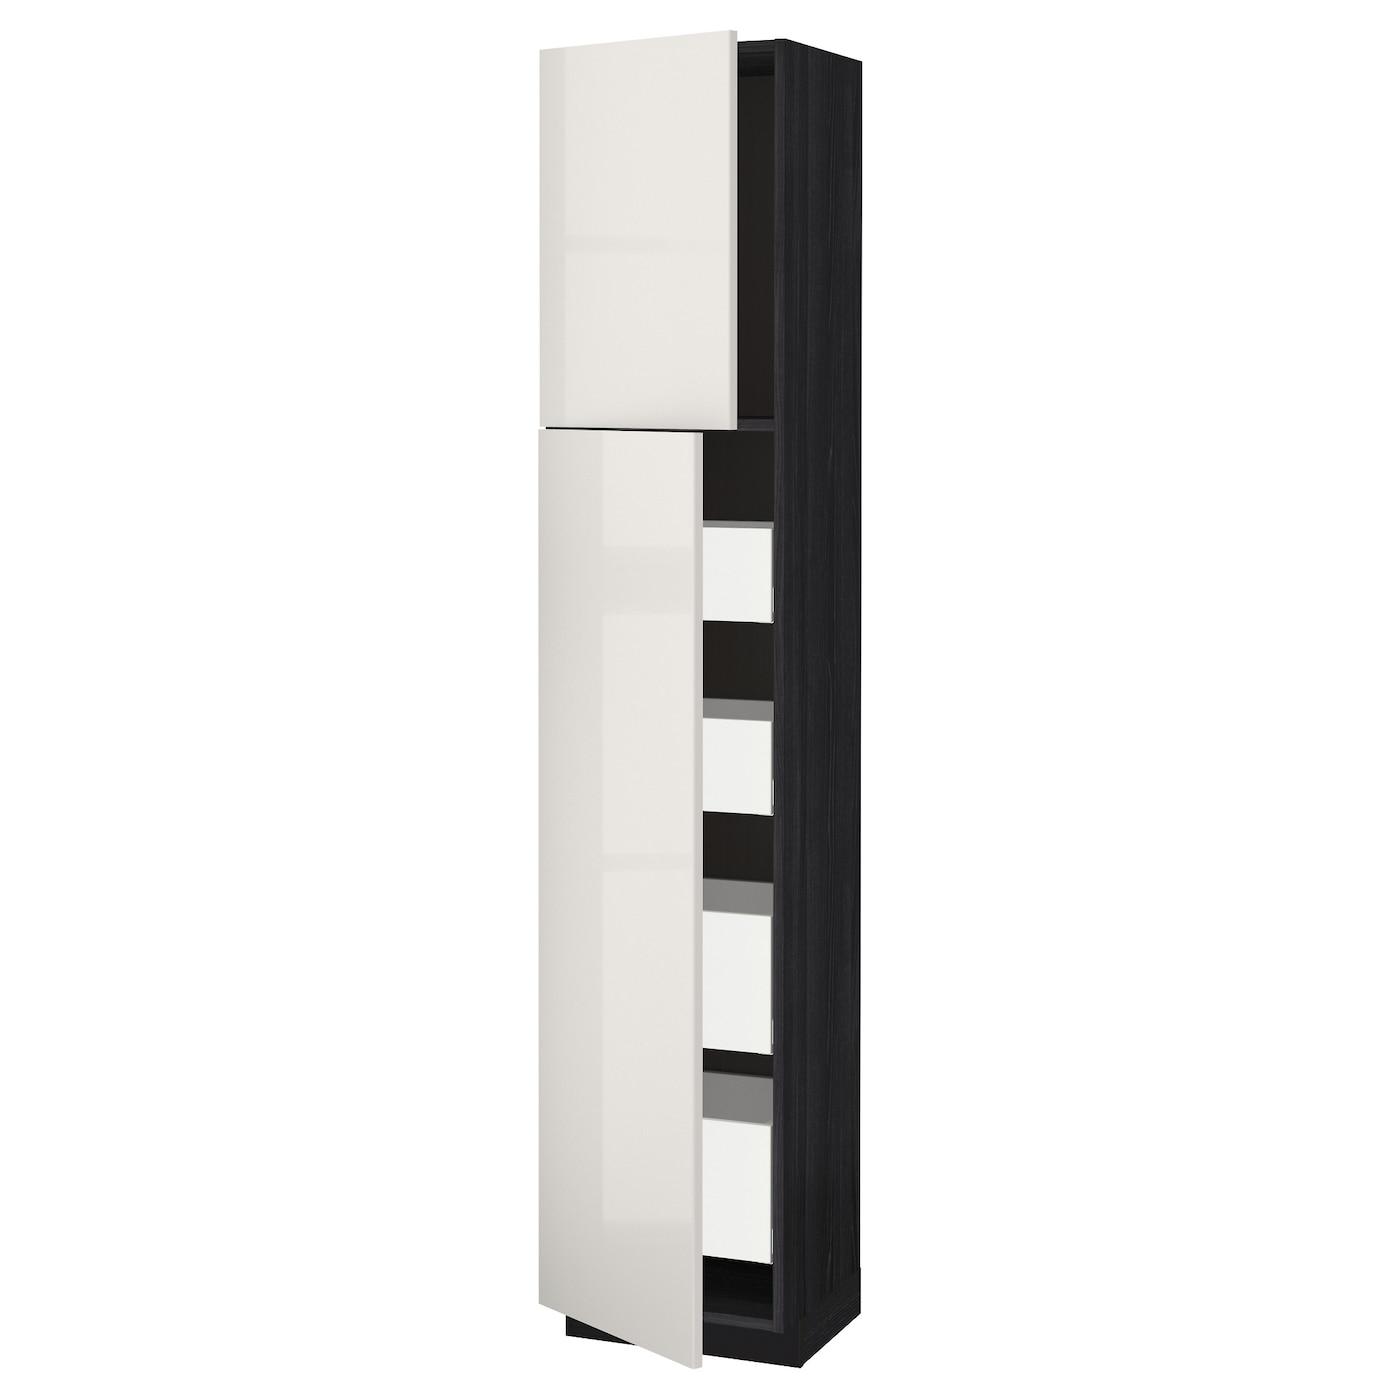 metod maximera armoire 2 portes 4 tiroirs noir ringhult. Black Bedroom Furniture Sets. Home Design Ideas